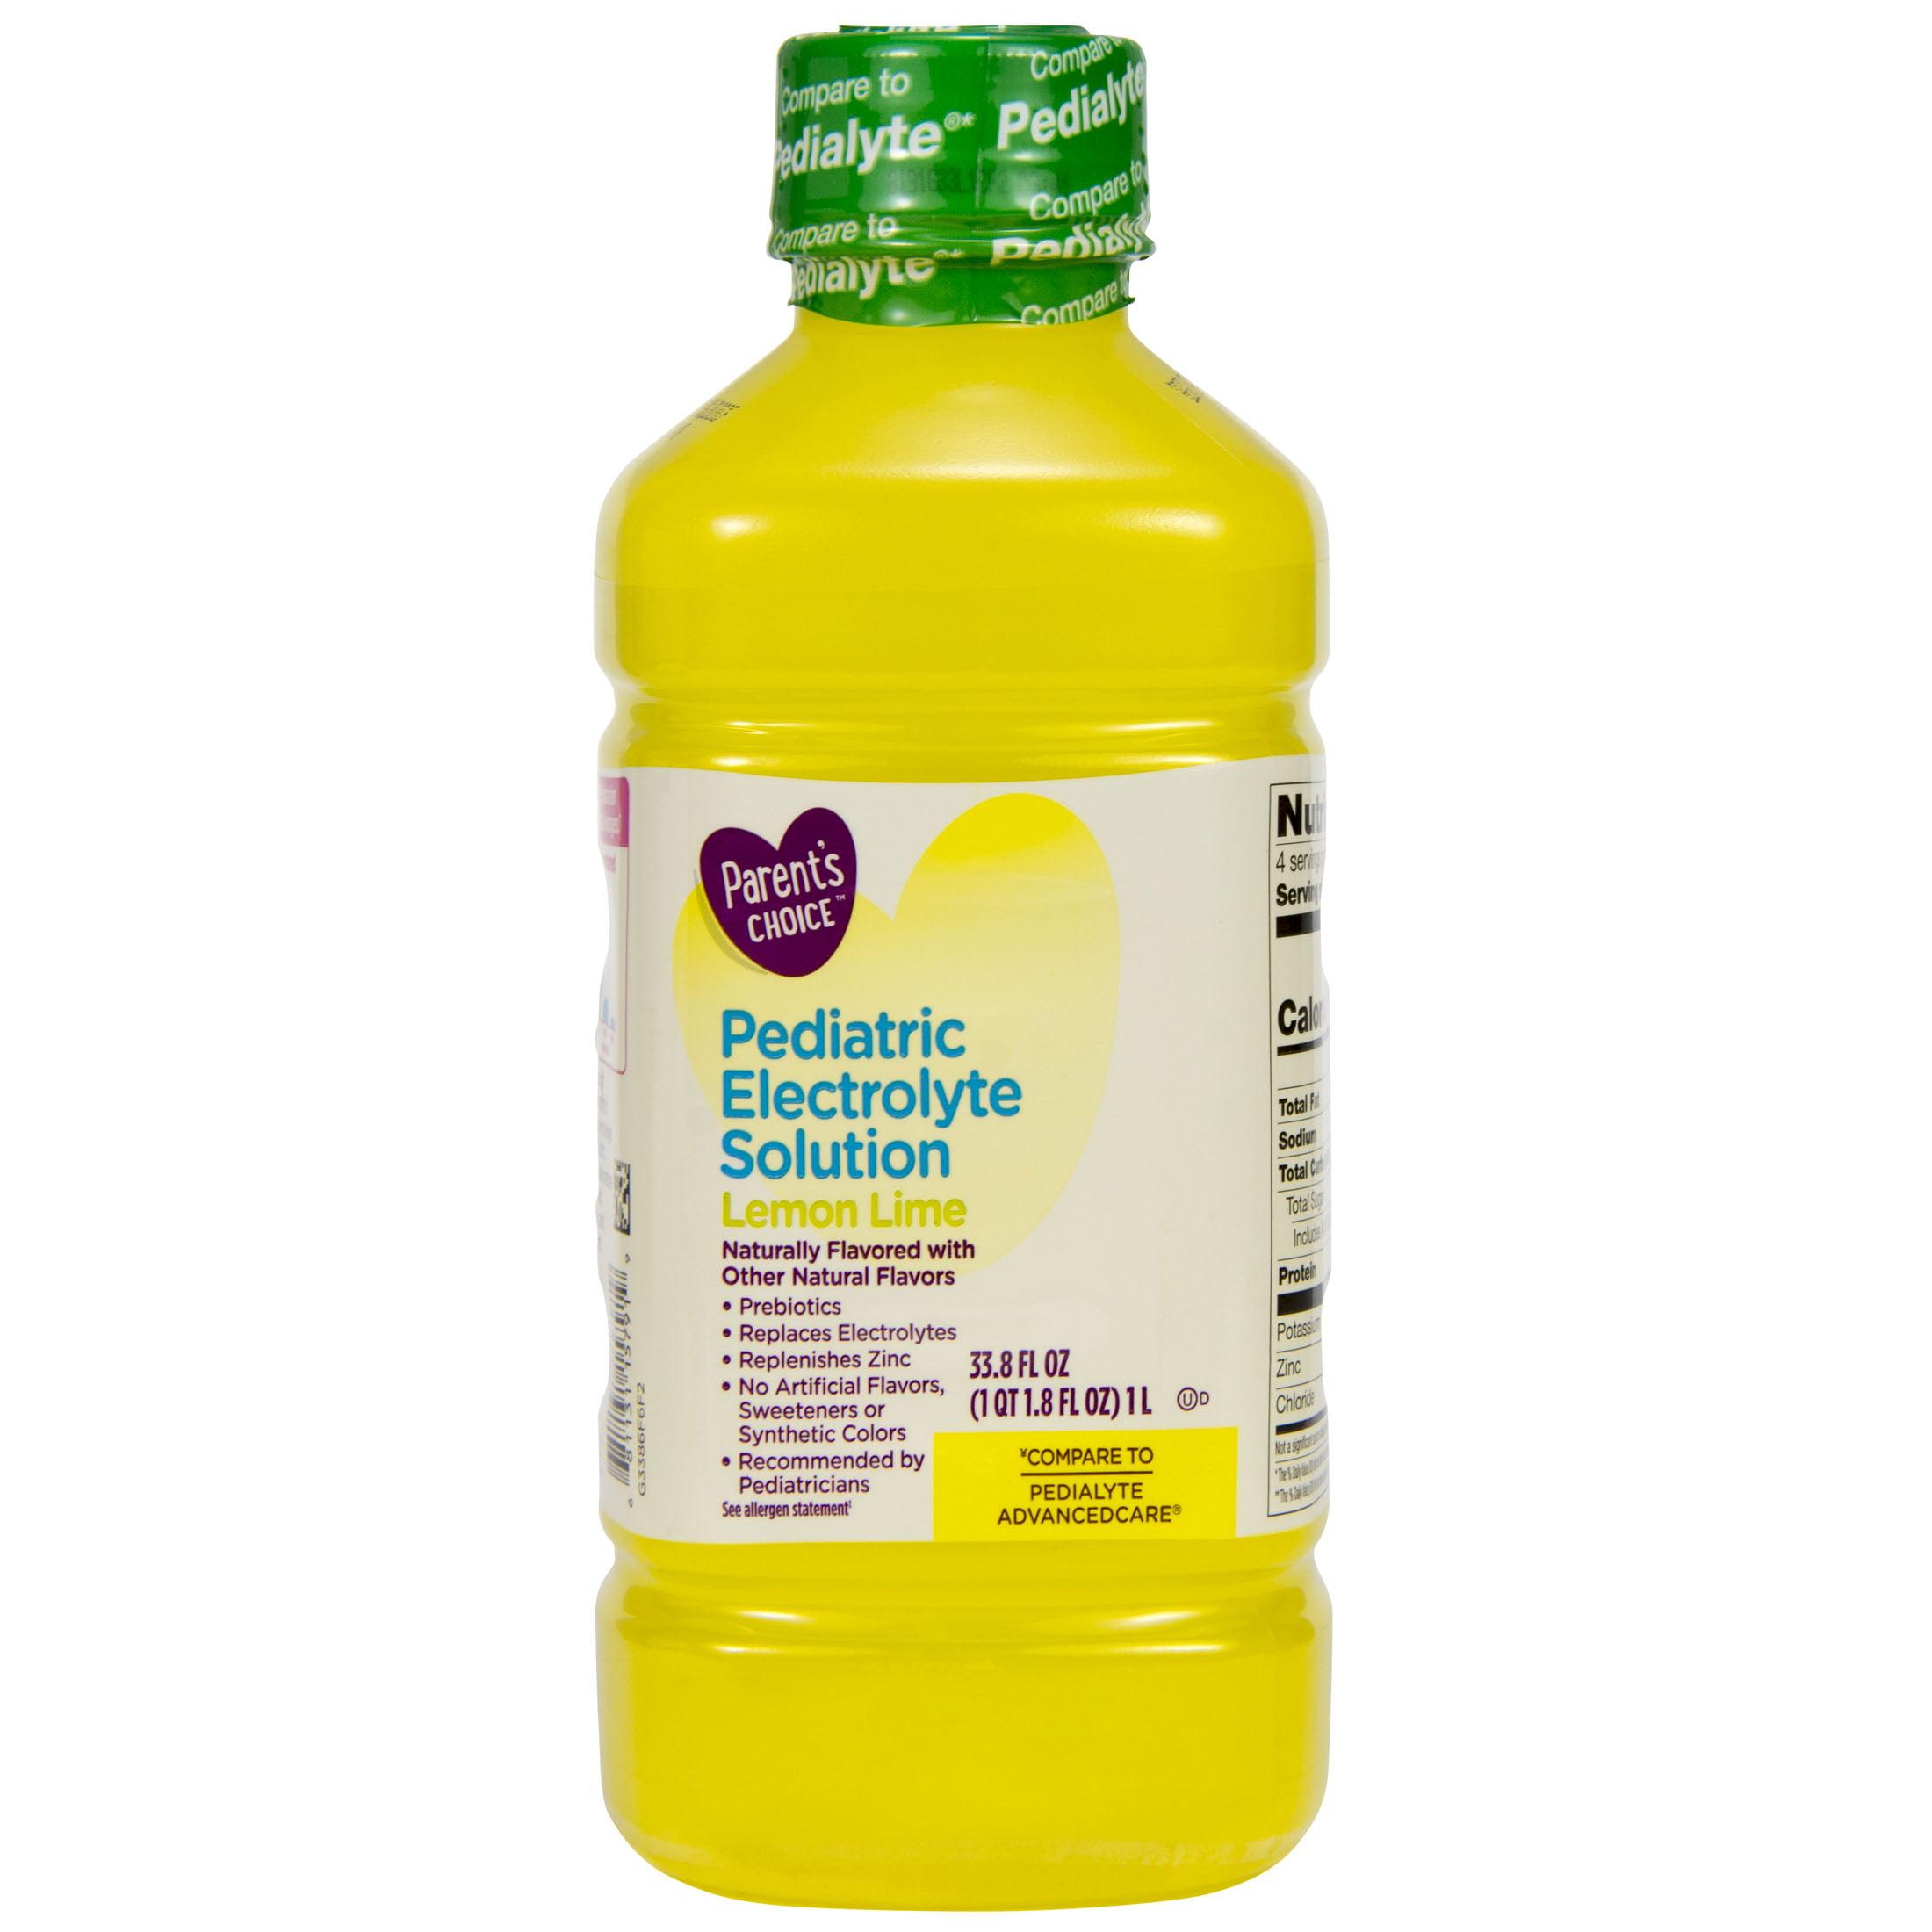 Parent's Choice Lemon Lime Electrolyte Solution, 1 Liter